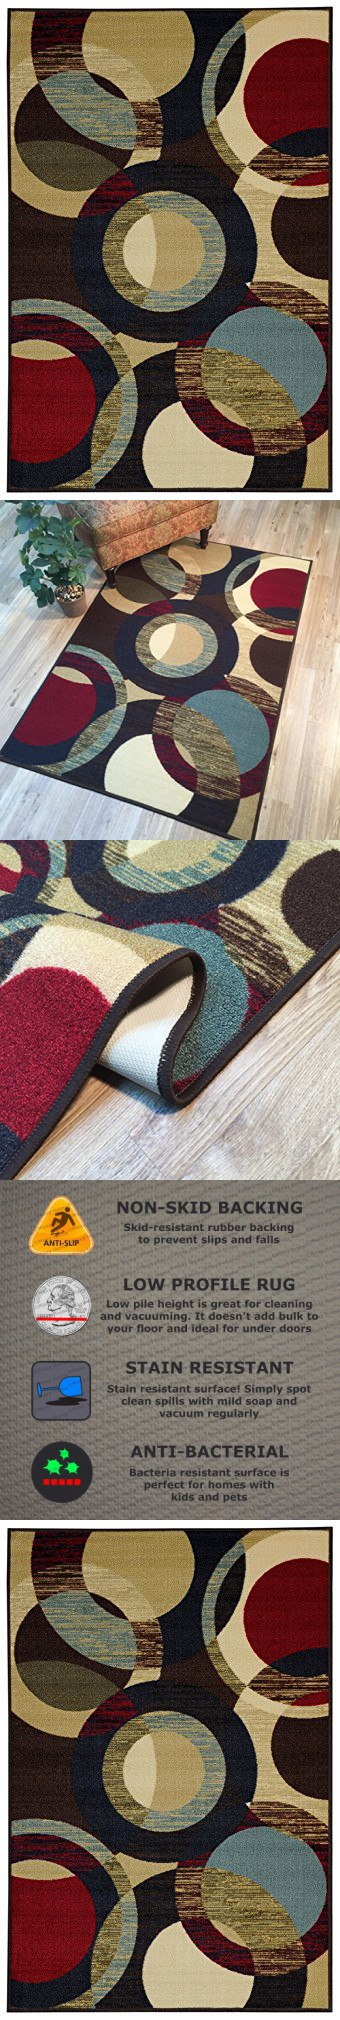 Anti Bacterial Rubber Back Area Rugs Non Skid Slip 3x5 Floor Rug